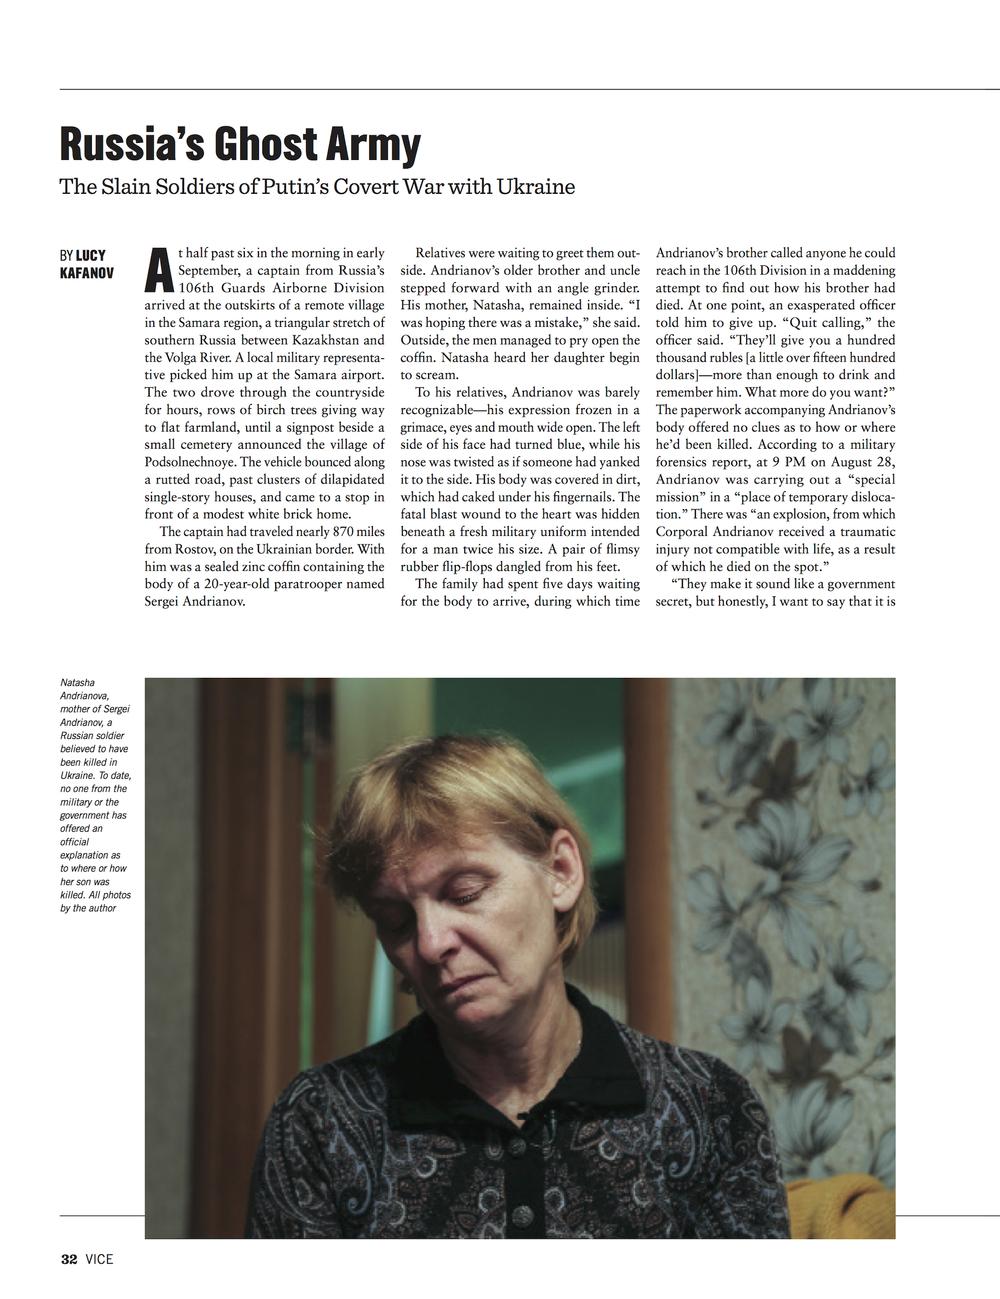 Lucy Kafanov Vice Magazine 1